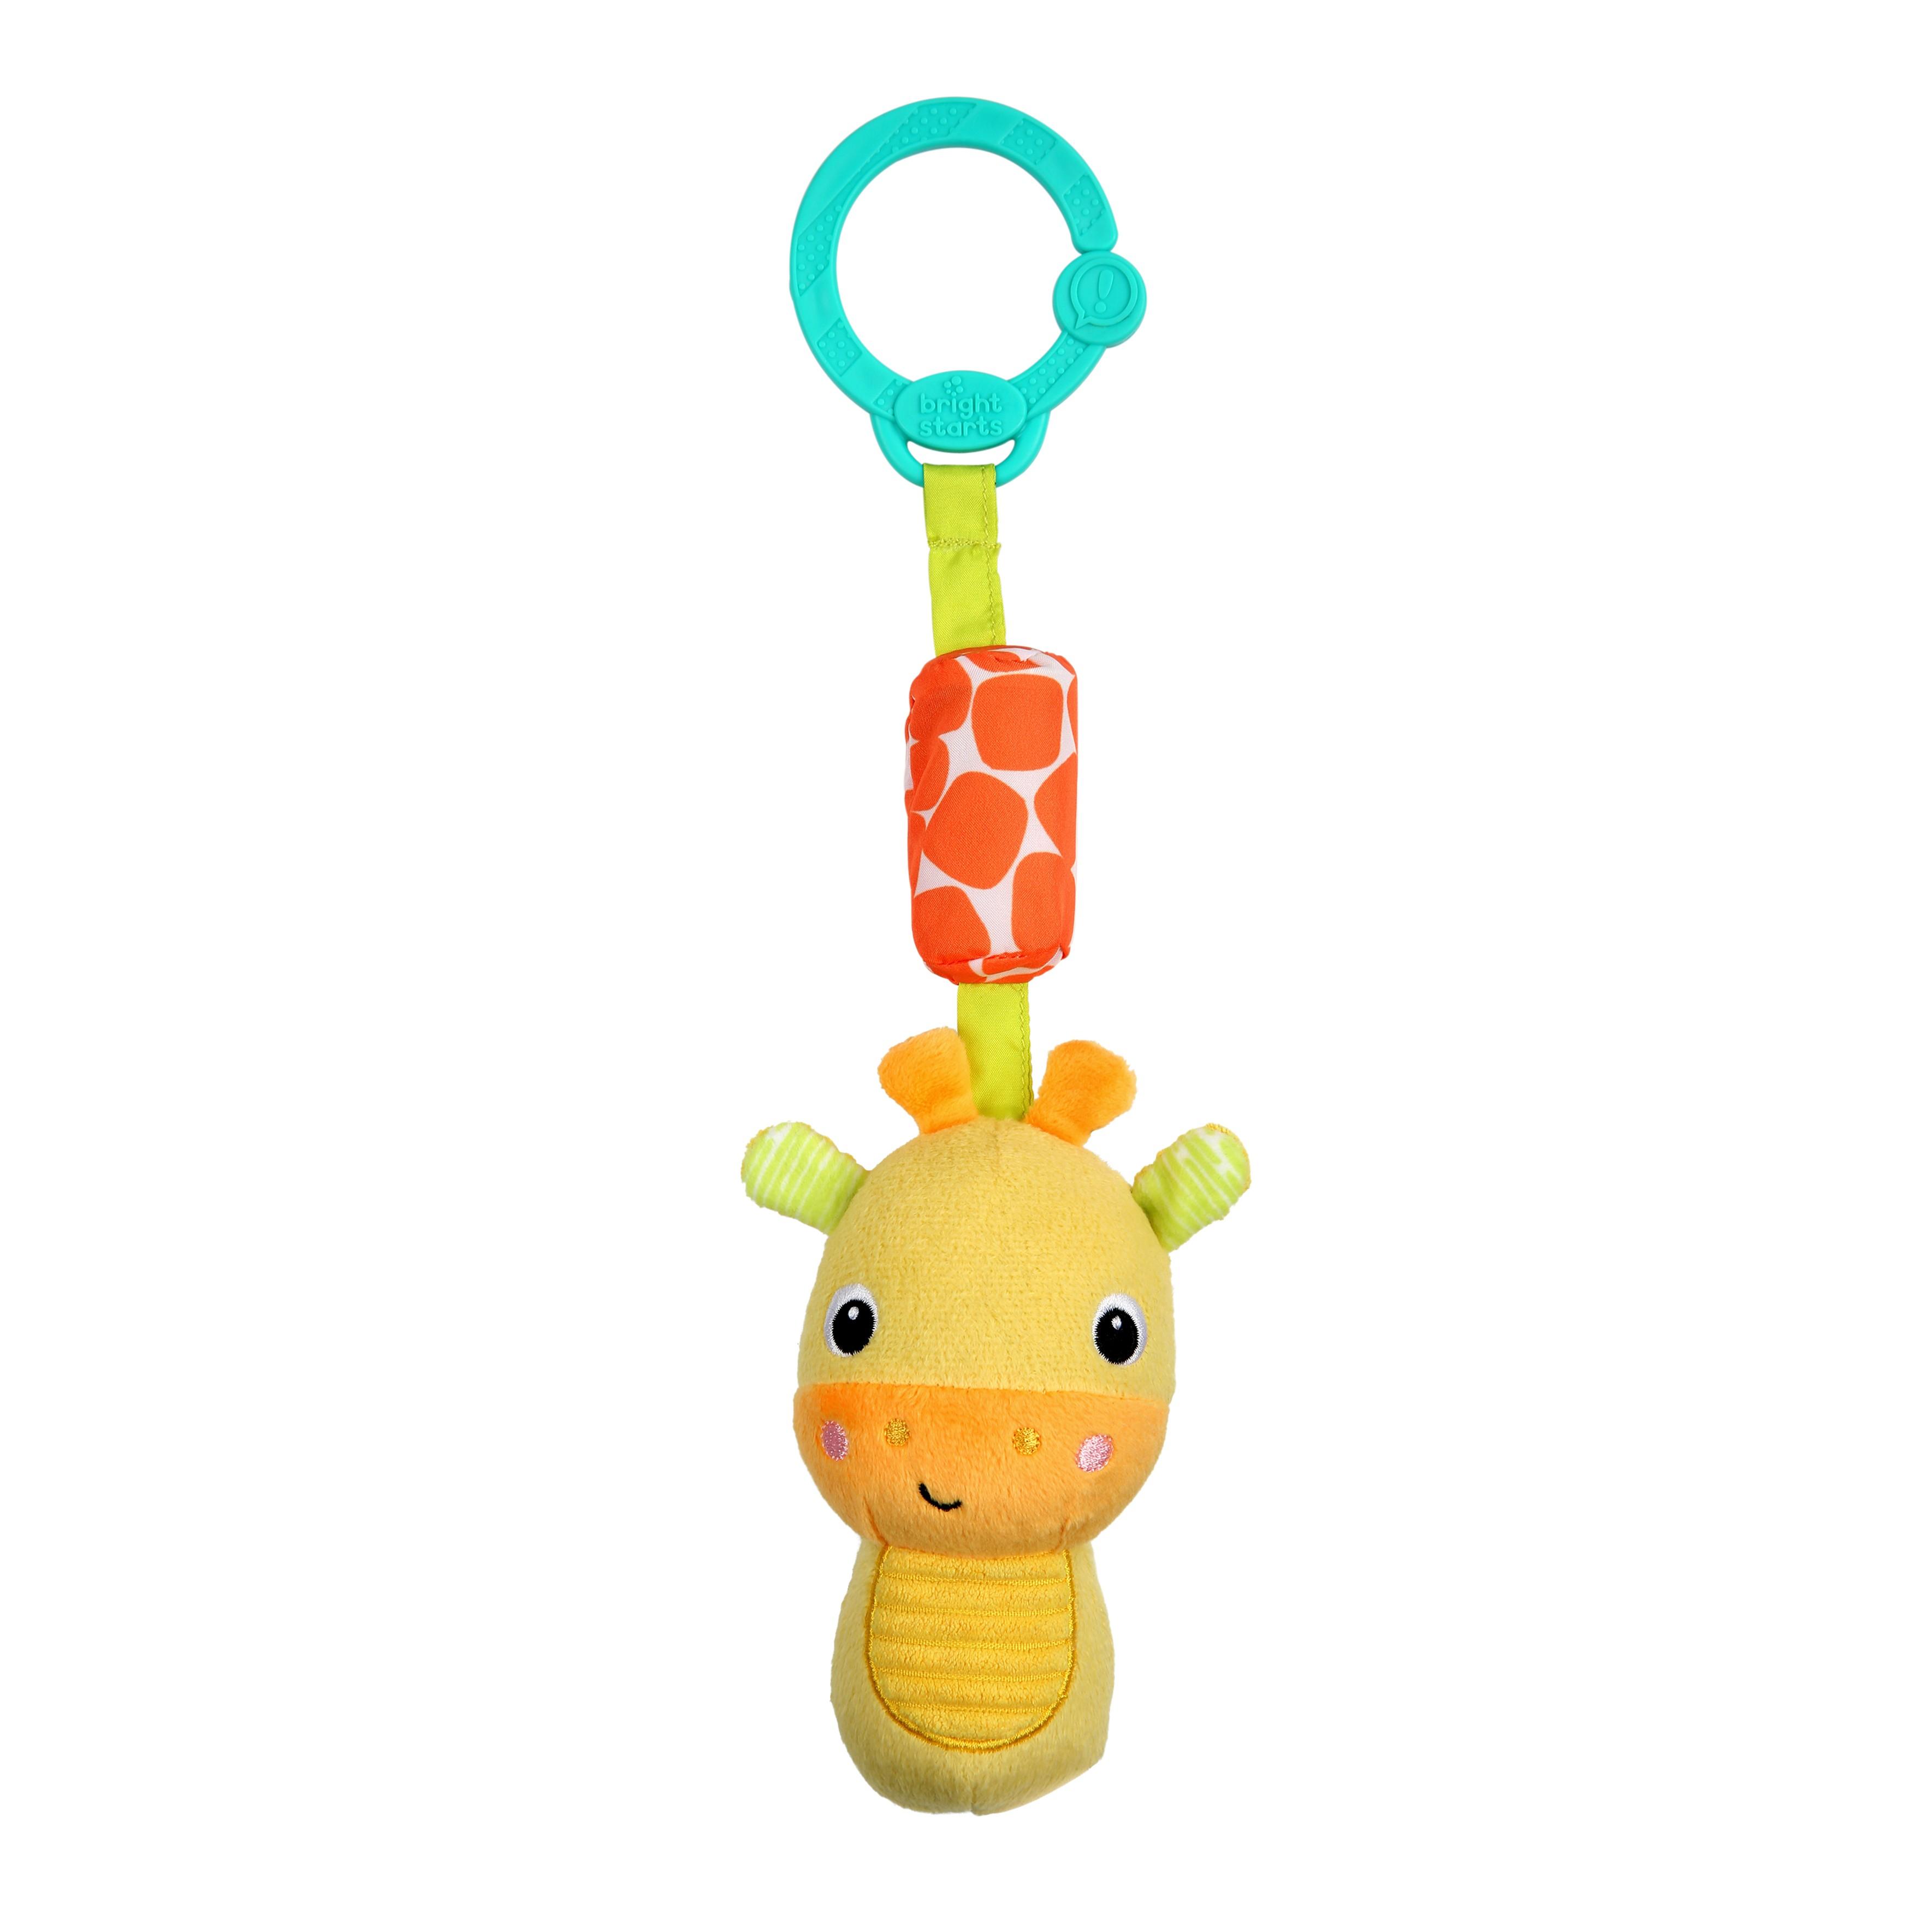 Hračka plyšová hrkálka na C krúžku Chime Along Friends žirafa 0m+